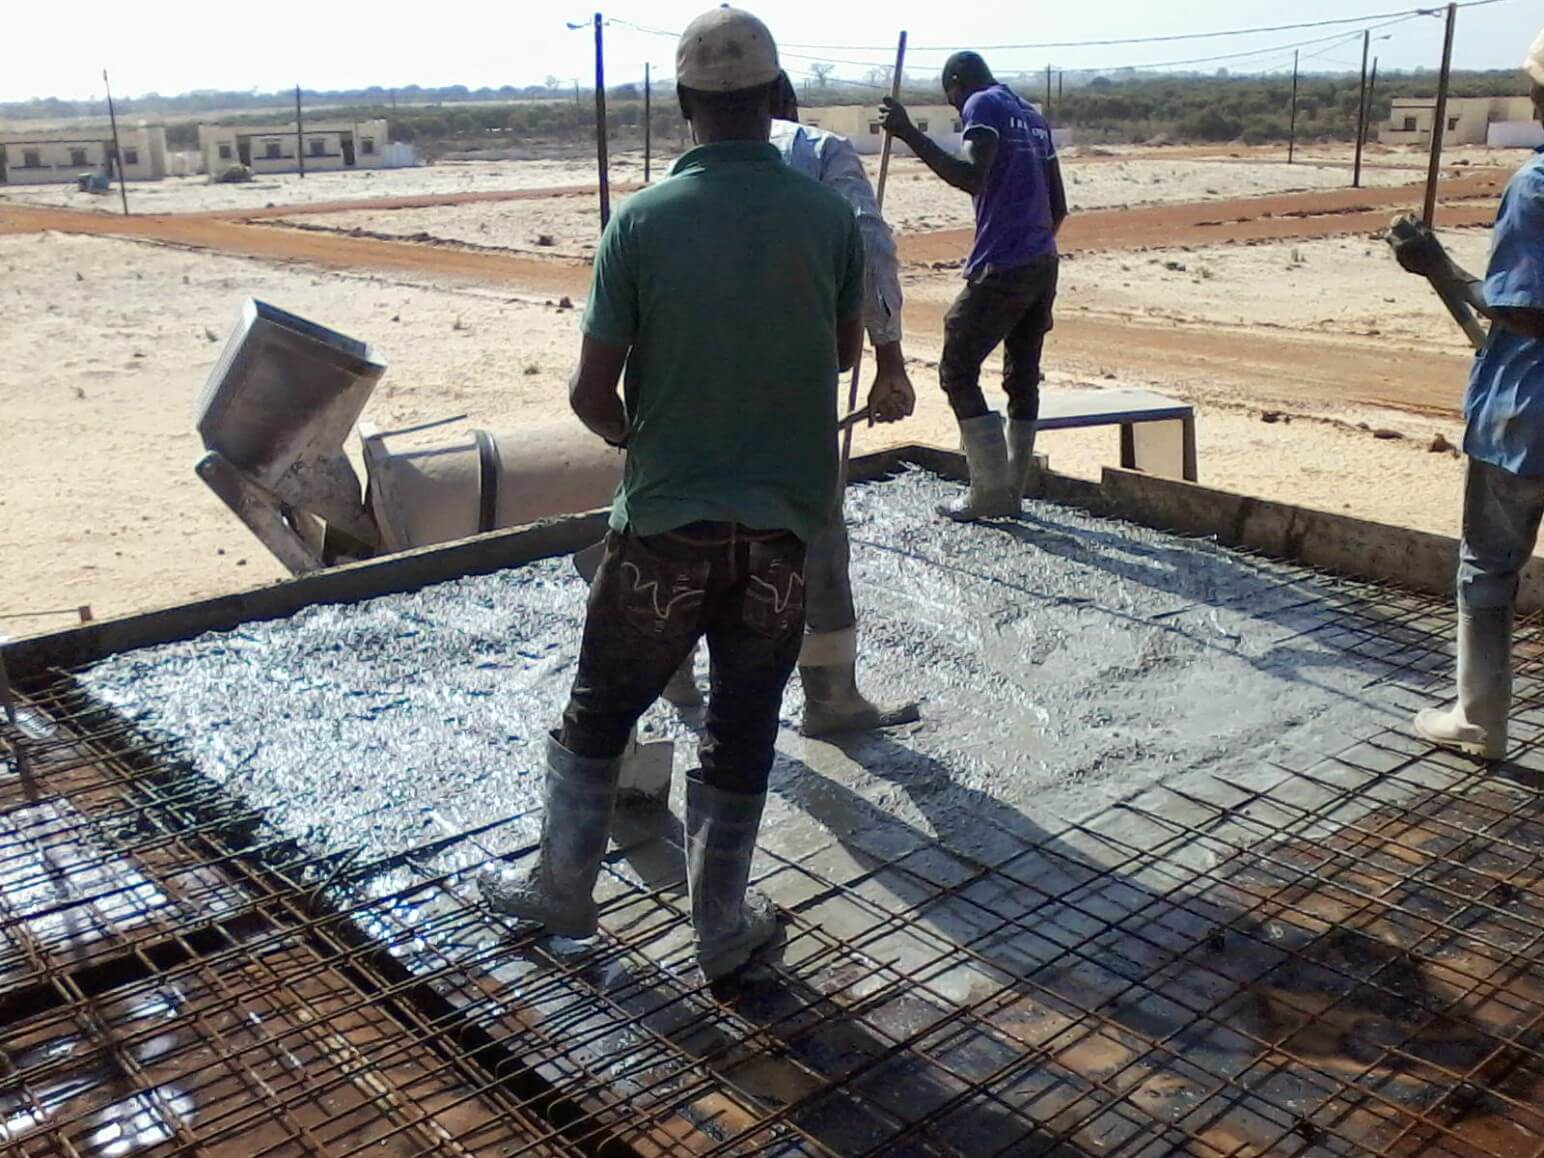 proyecto senegal encofrados de aluminio construccion strong forms alicante 8